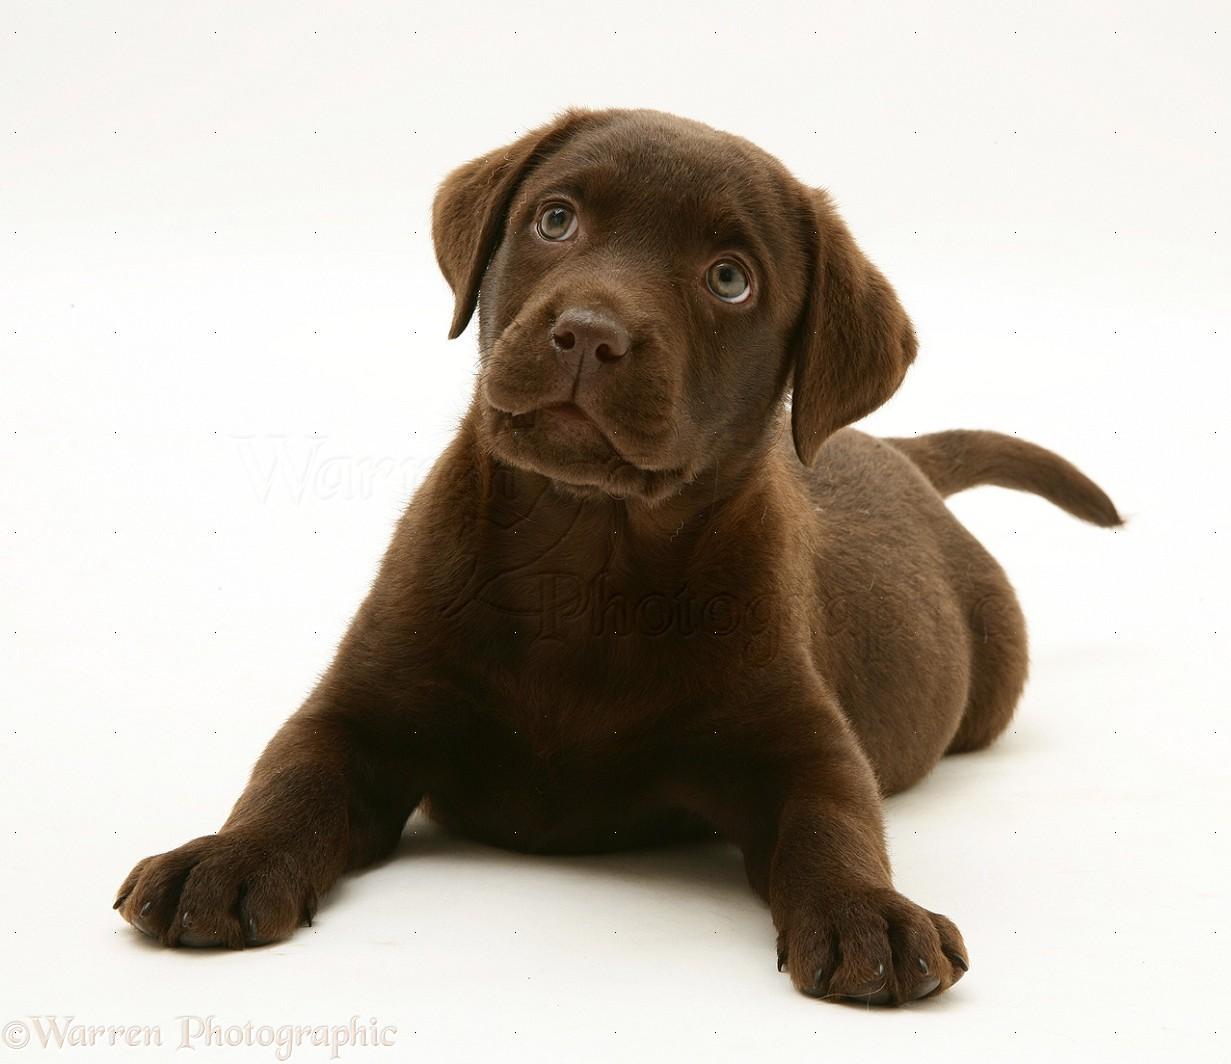 16819 Chocolate Labrador Retriever pup white backgroundjpg 1231x1064